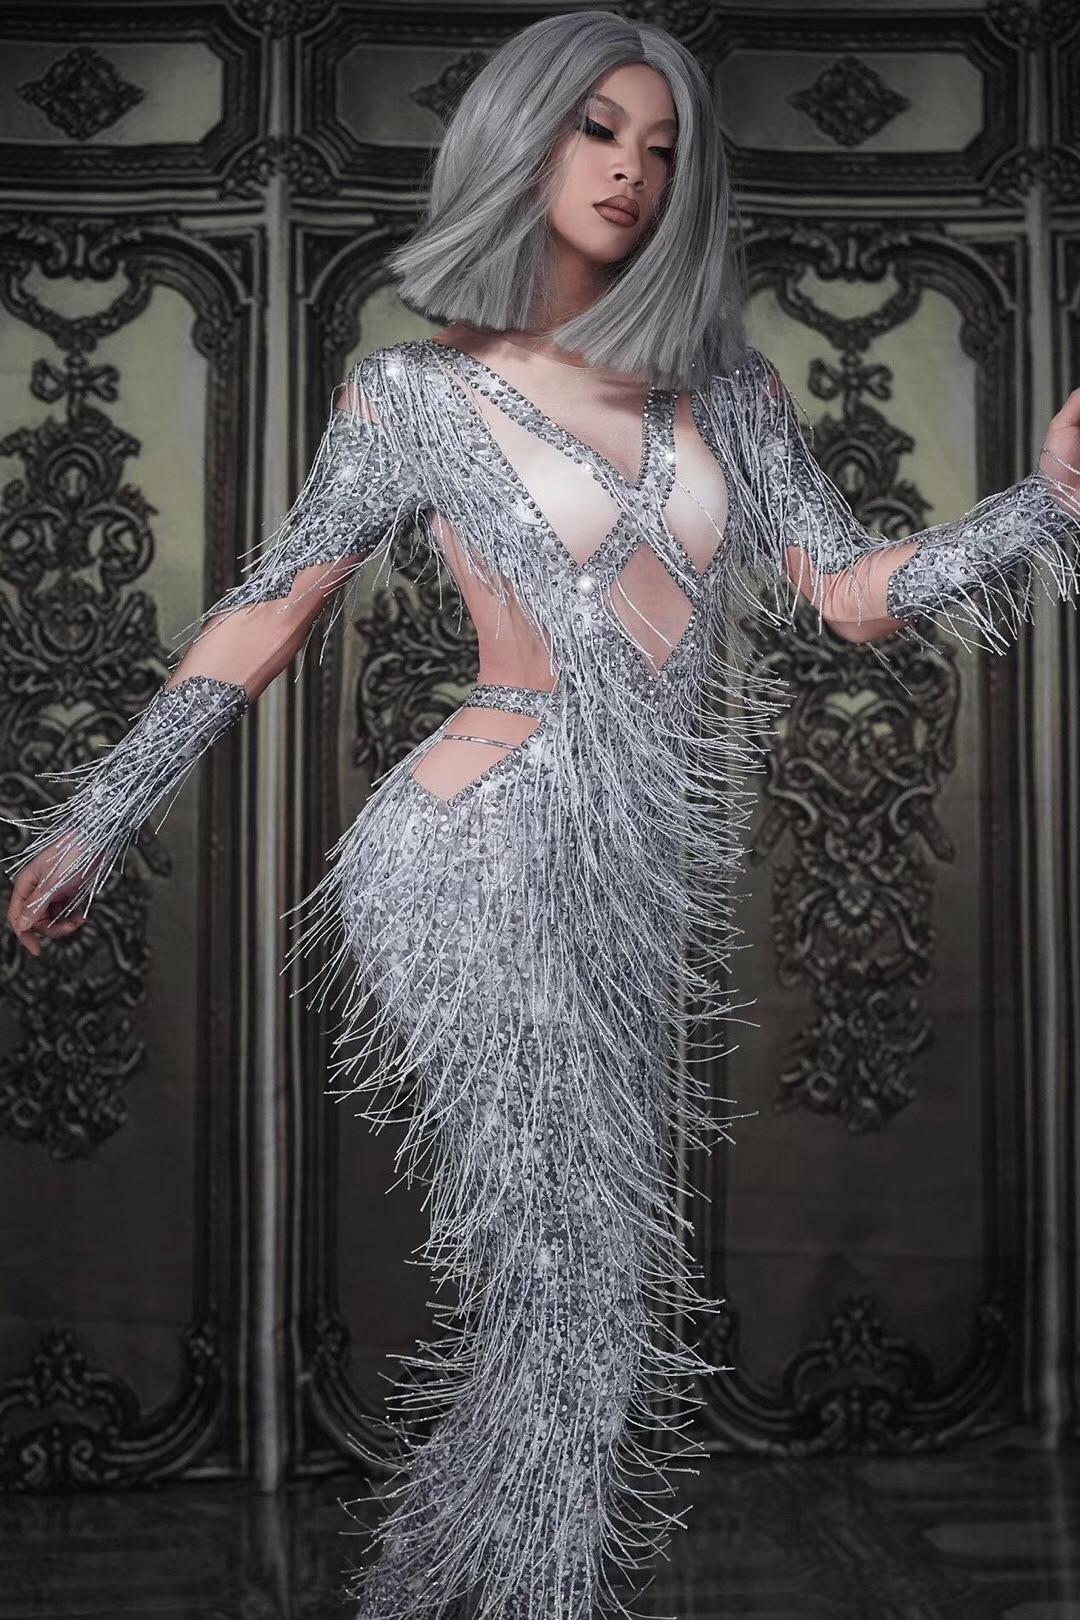 Nightclub bar DS singer DJ jazz dance sexy fake meat gogo guest performance full of Diamond Silver fringe